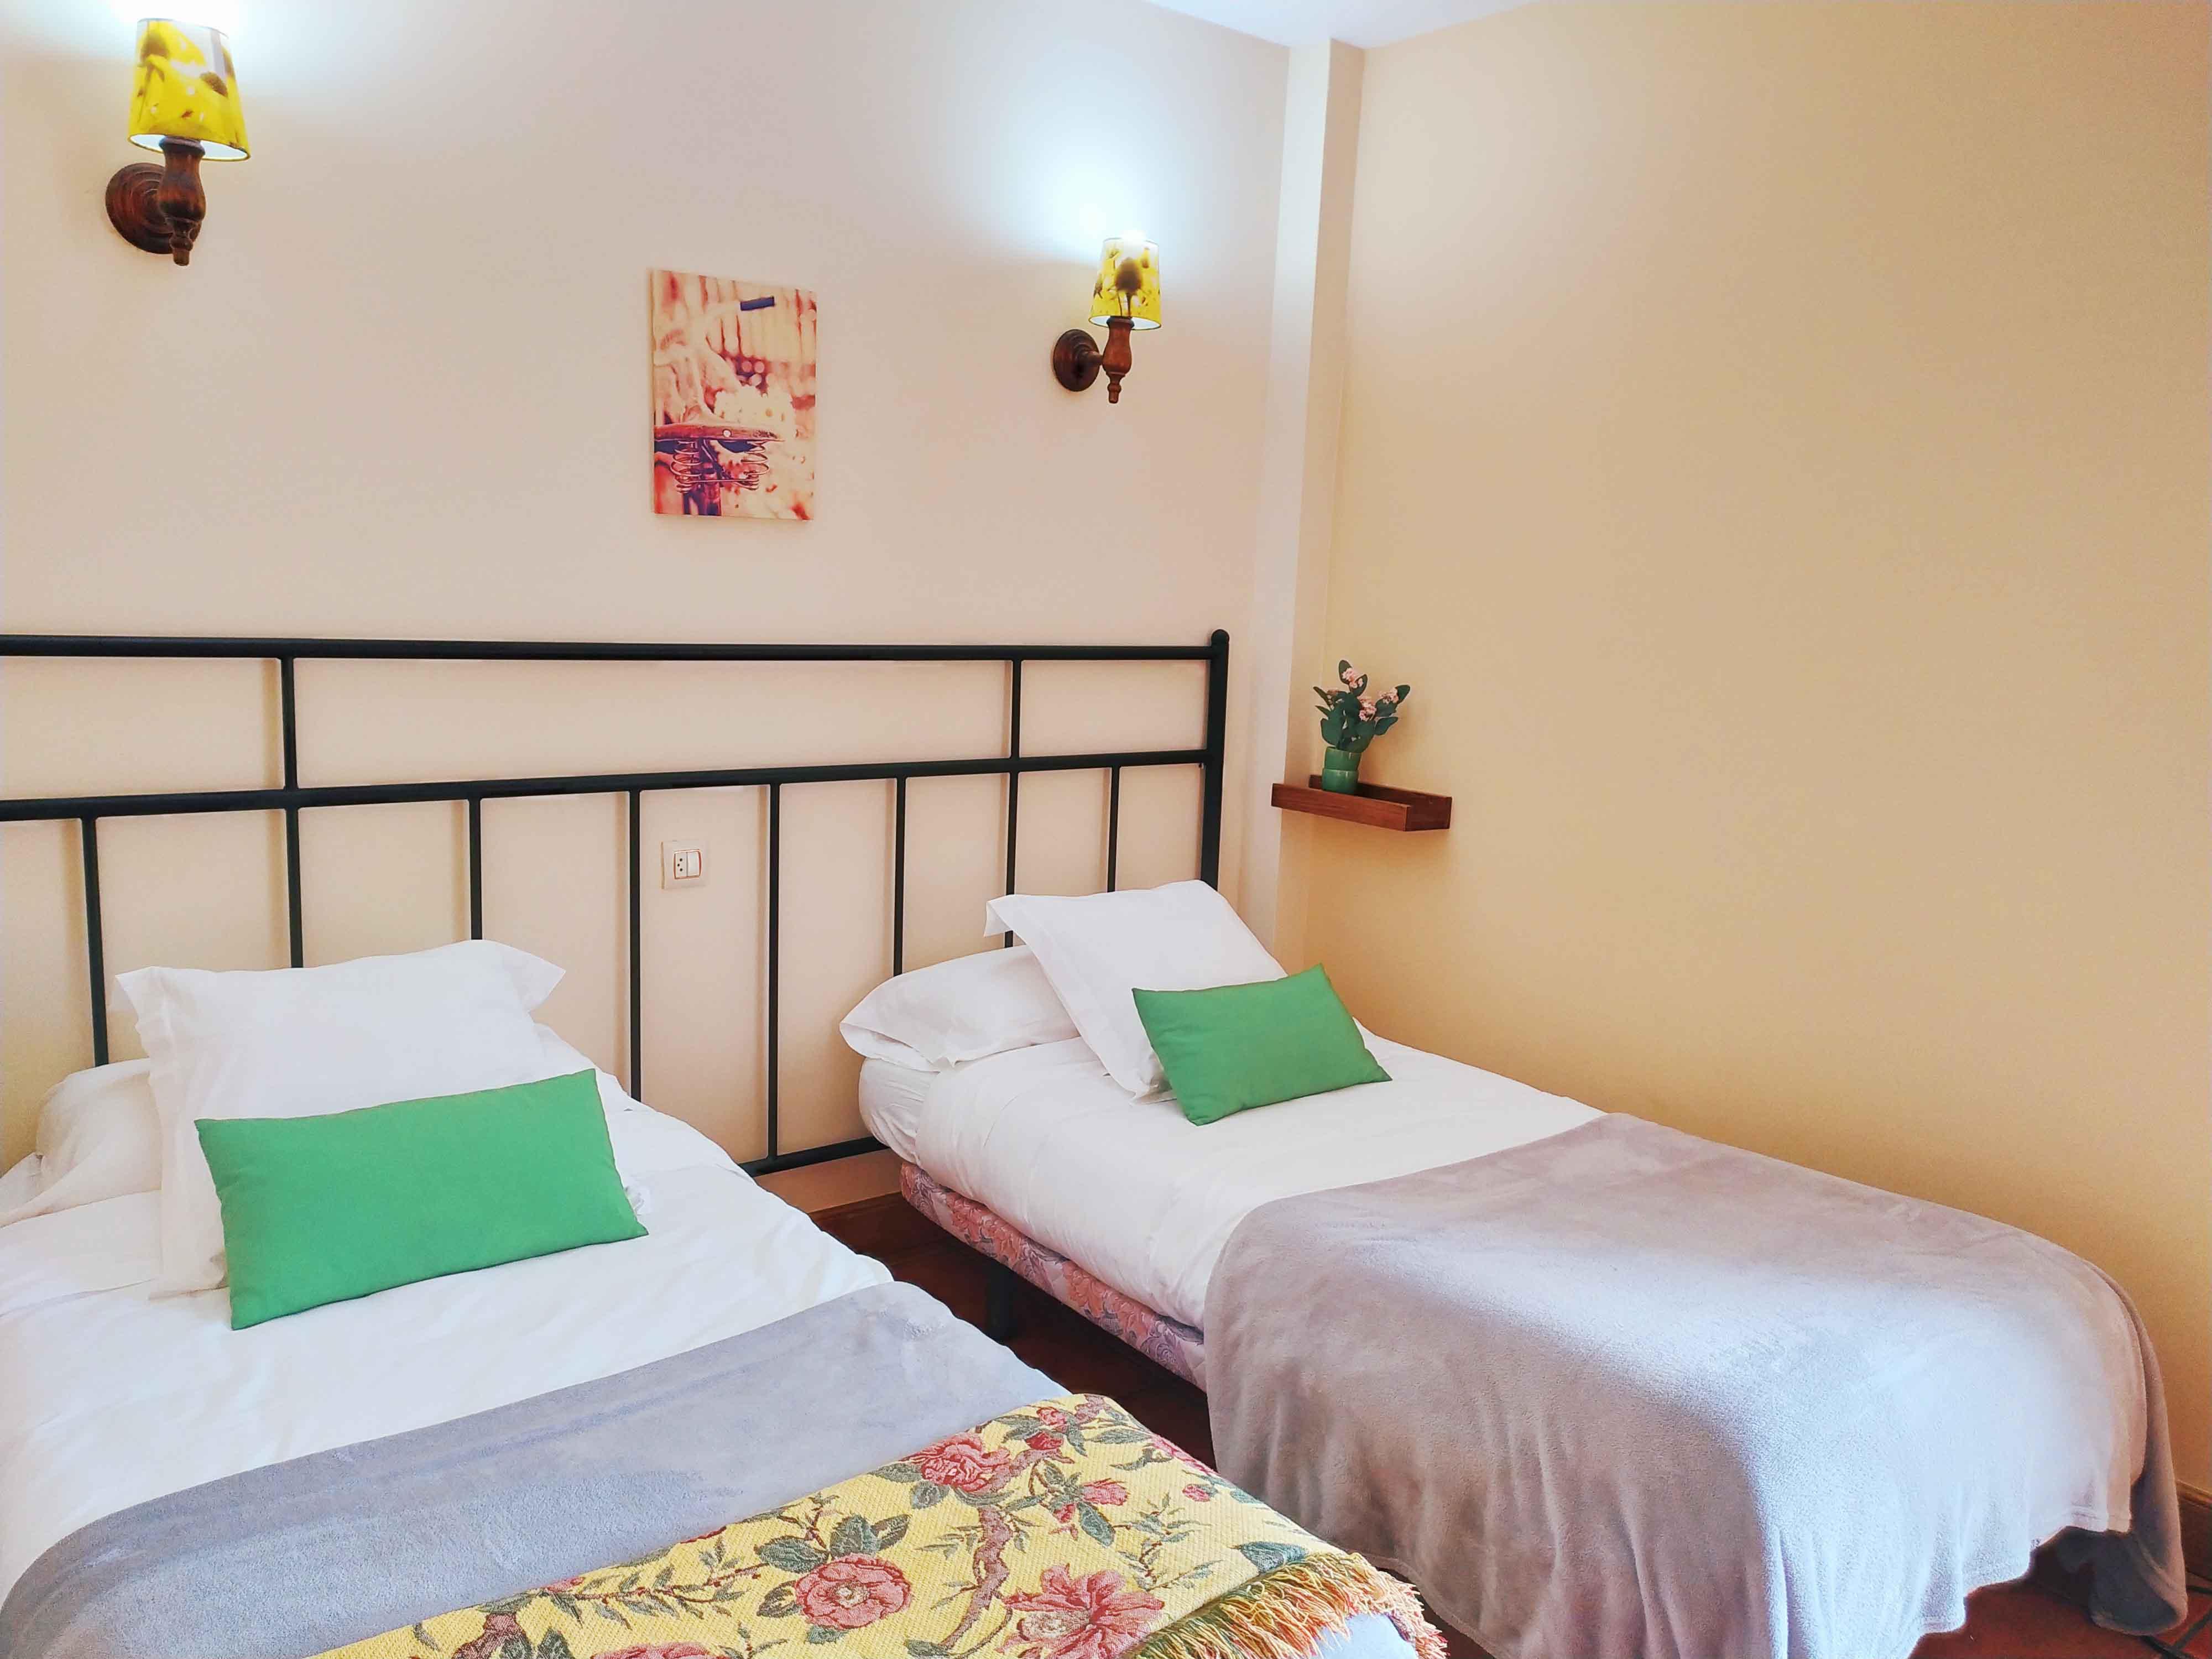 Apartamento 4 opción 2 camas